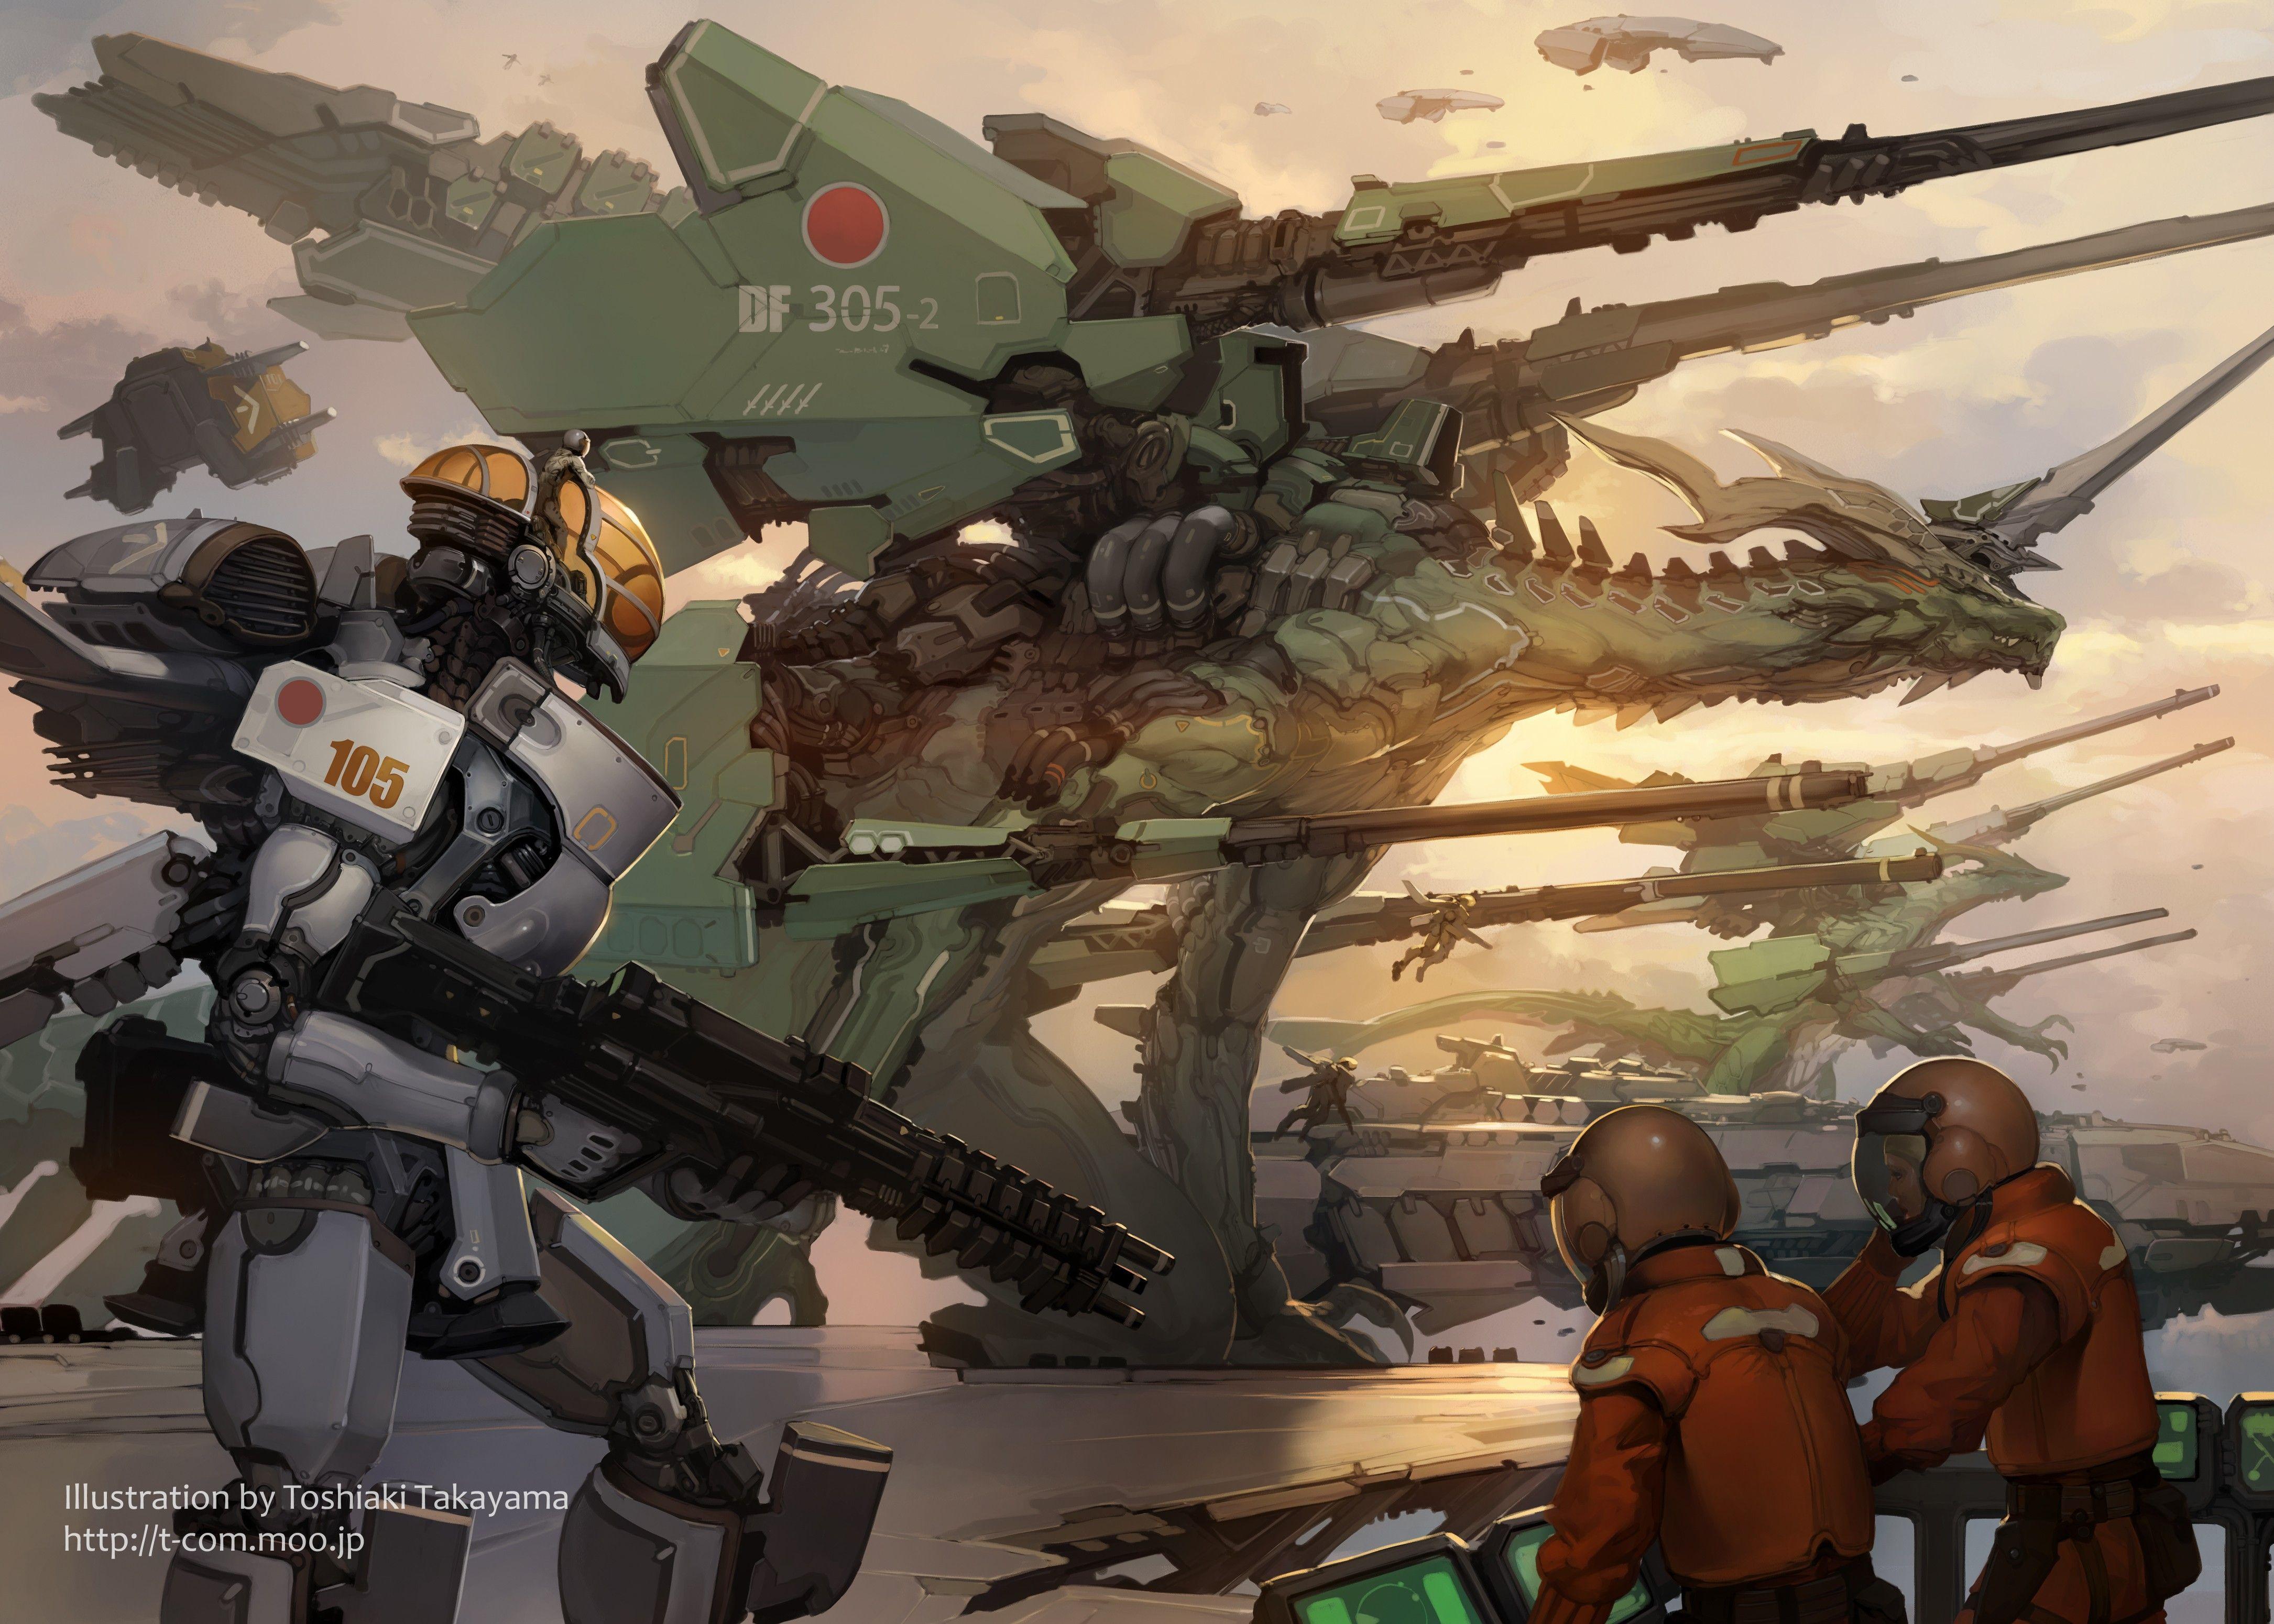 People Futuristic Military Weapon Dragon Mech Wallpaper No 190484 Robot Art Art Sci Fi Wallpaper